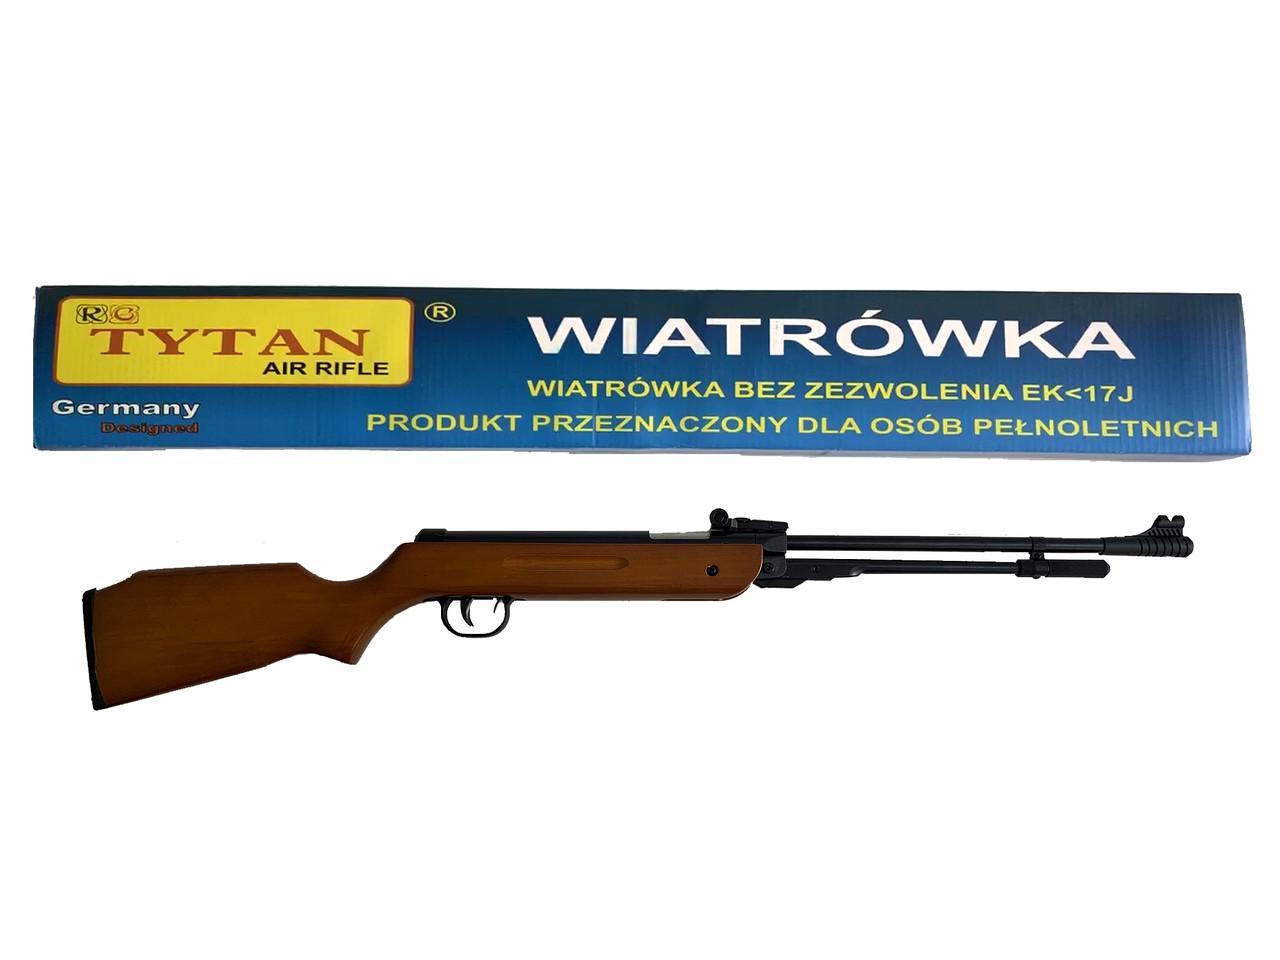 Пневматическая винтовка TYTAN B3-3